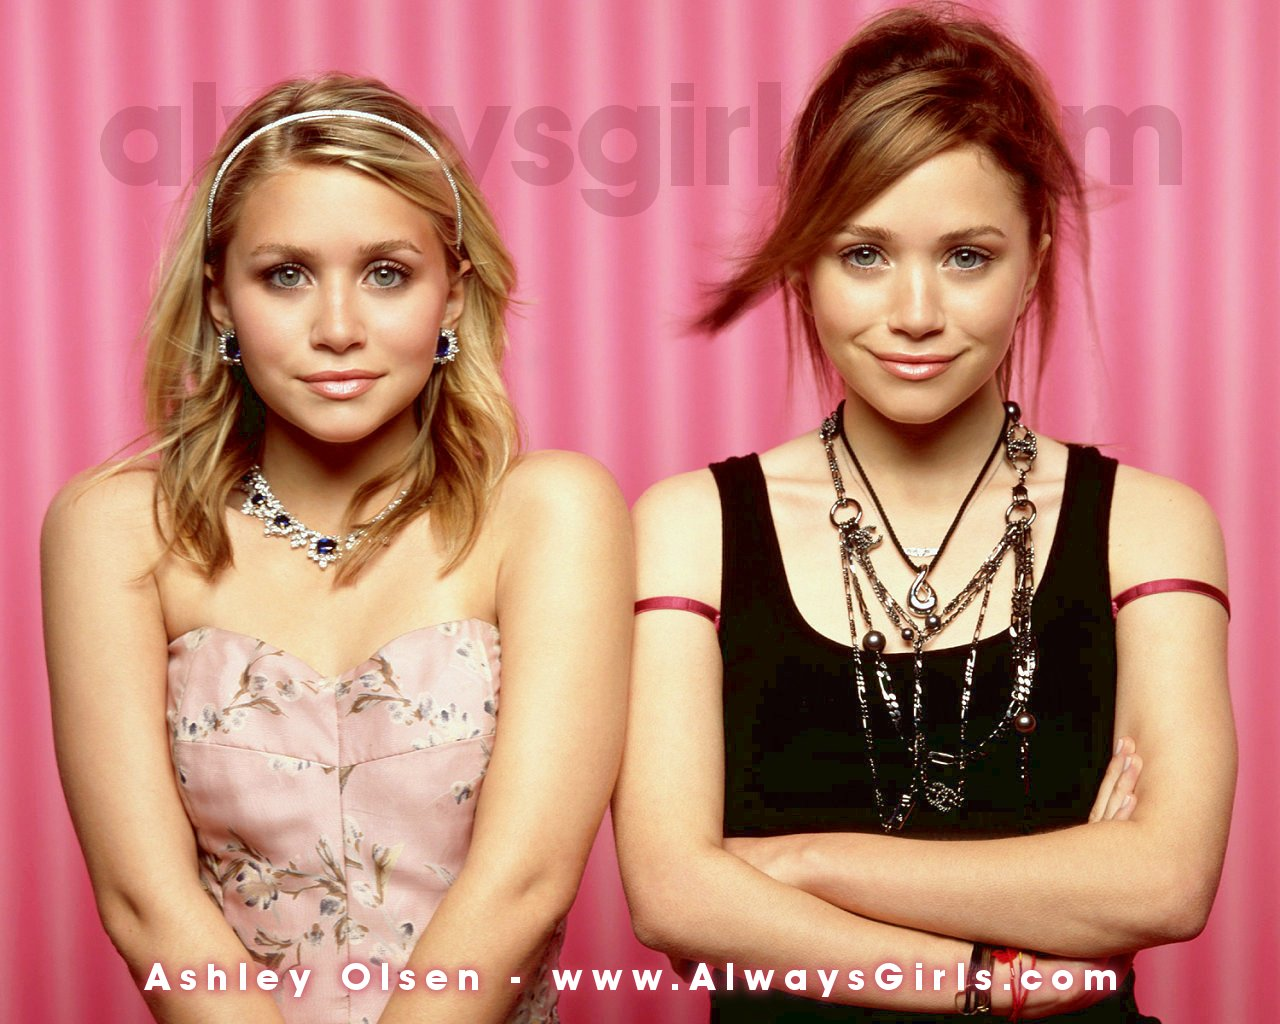 Olsen Twins Wallpapers list 1280x1024